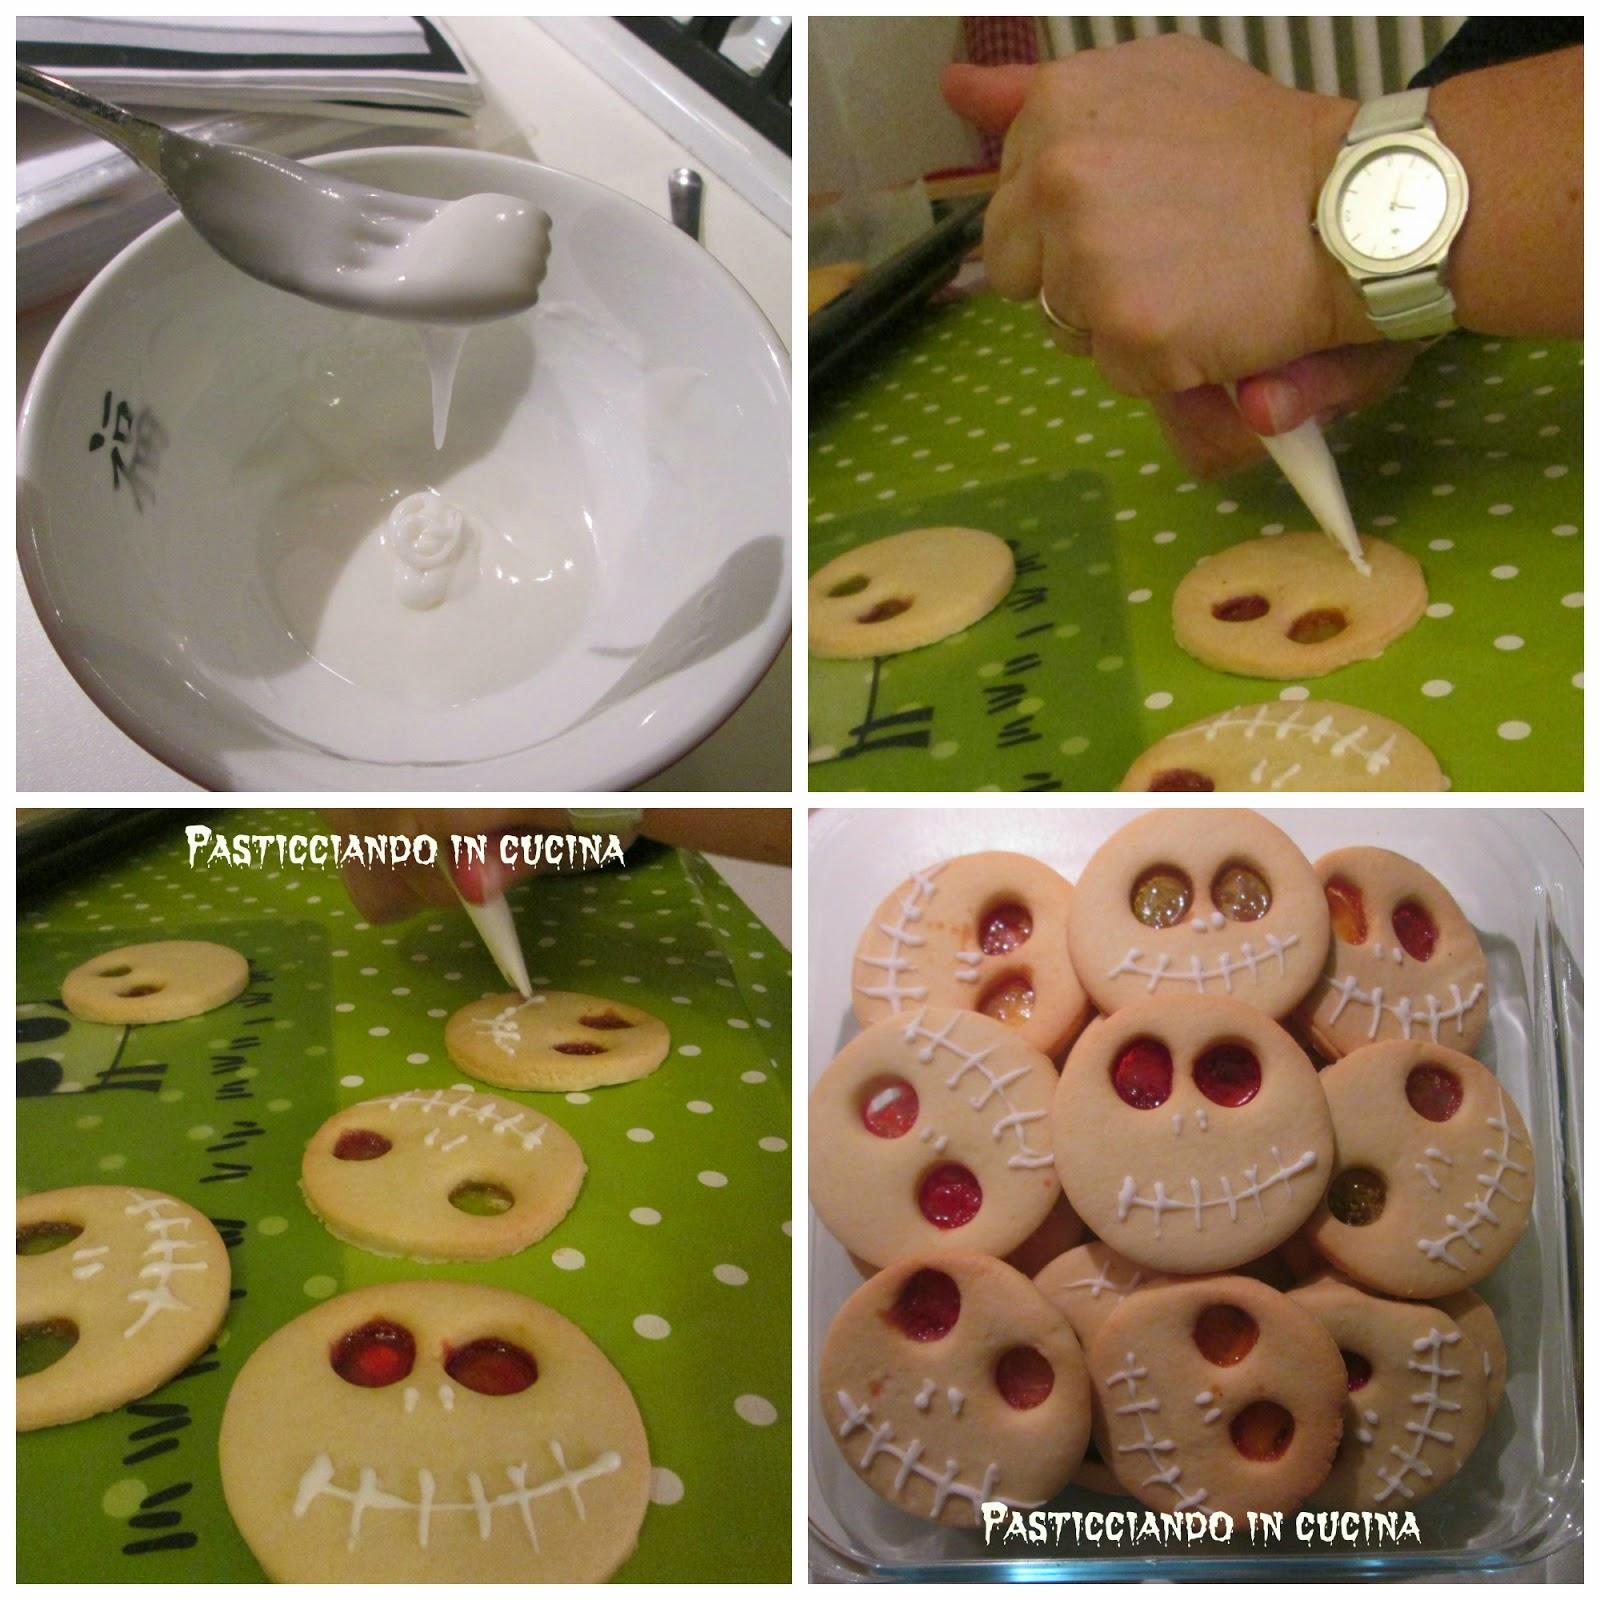 Pasticciando In Cucina: Biscotti Mostruosi Per Halloween #4F5D08 1600 1600 Ricette Cucina Disegnate